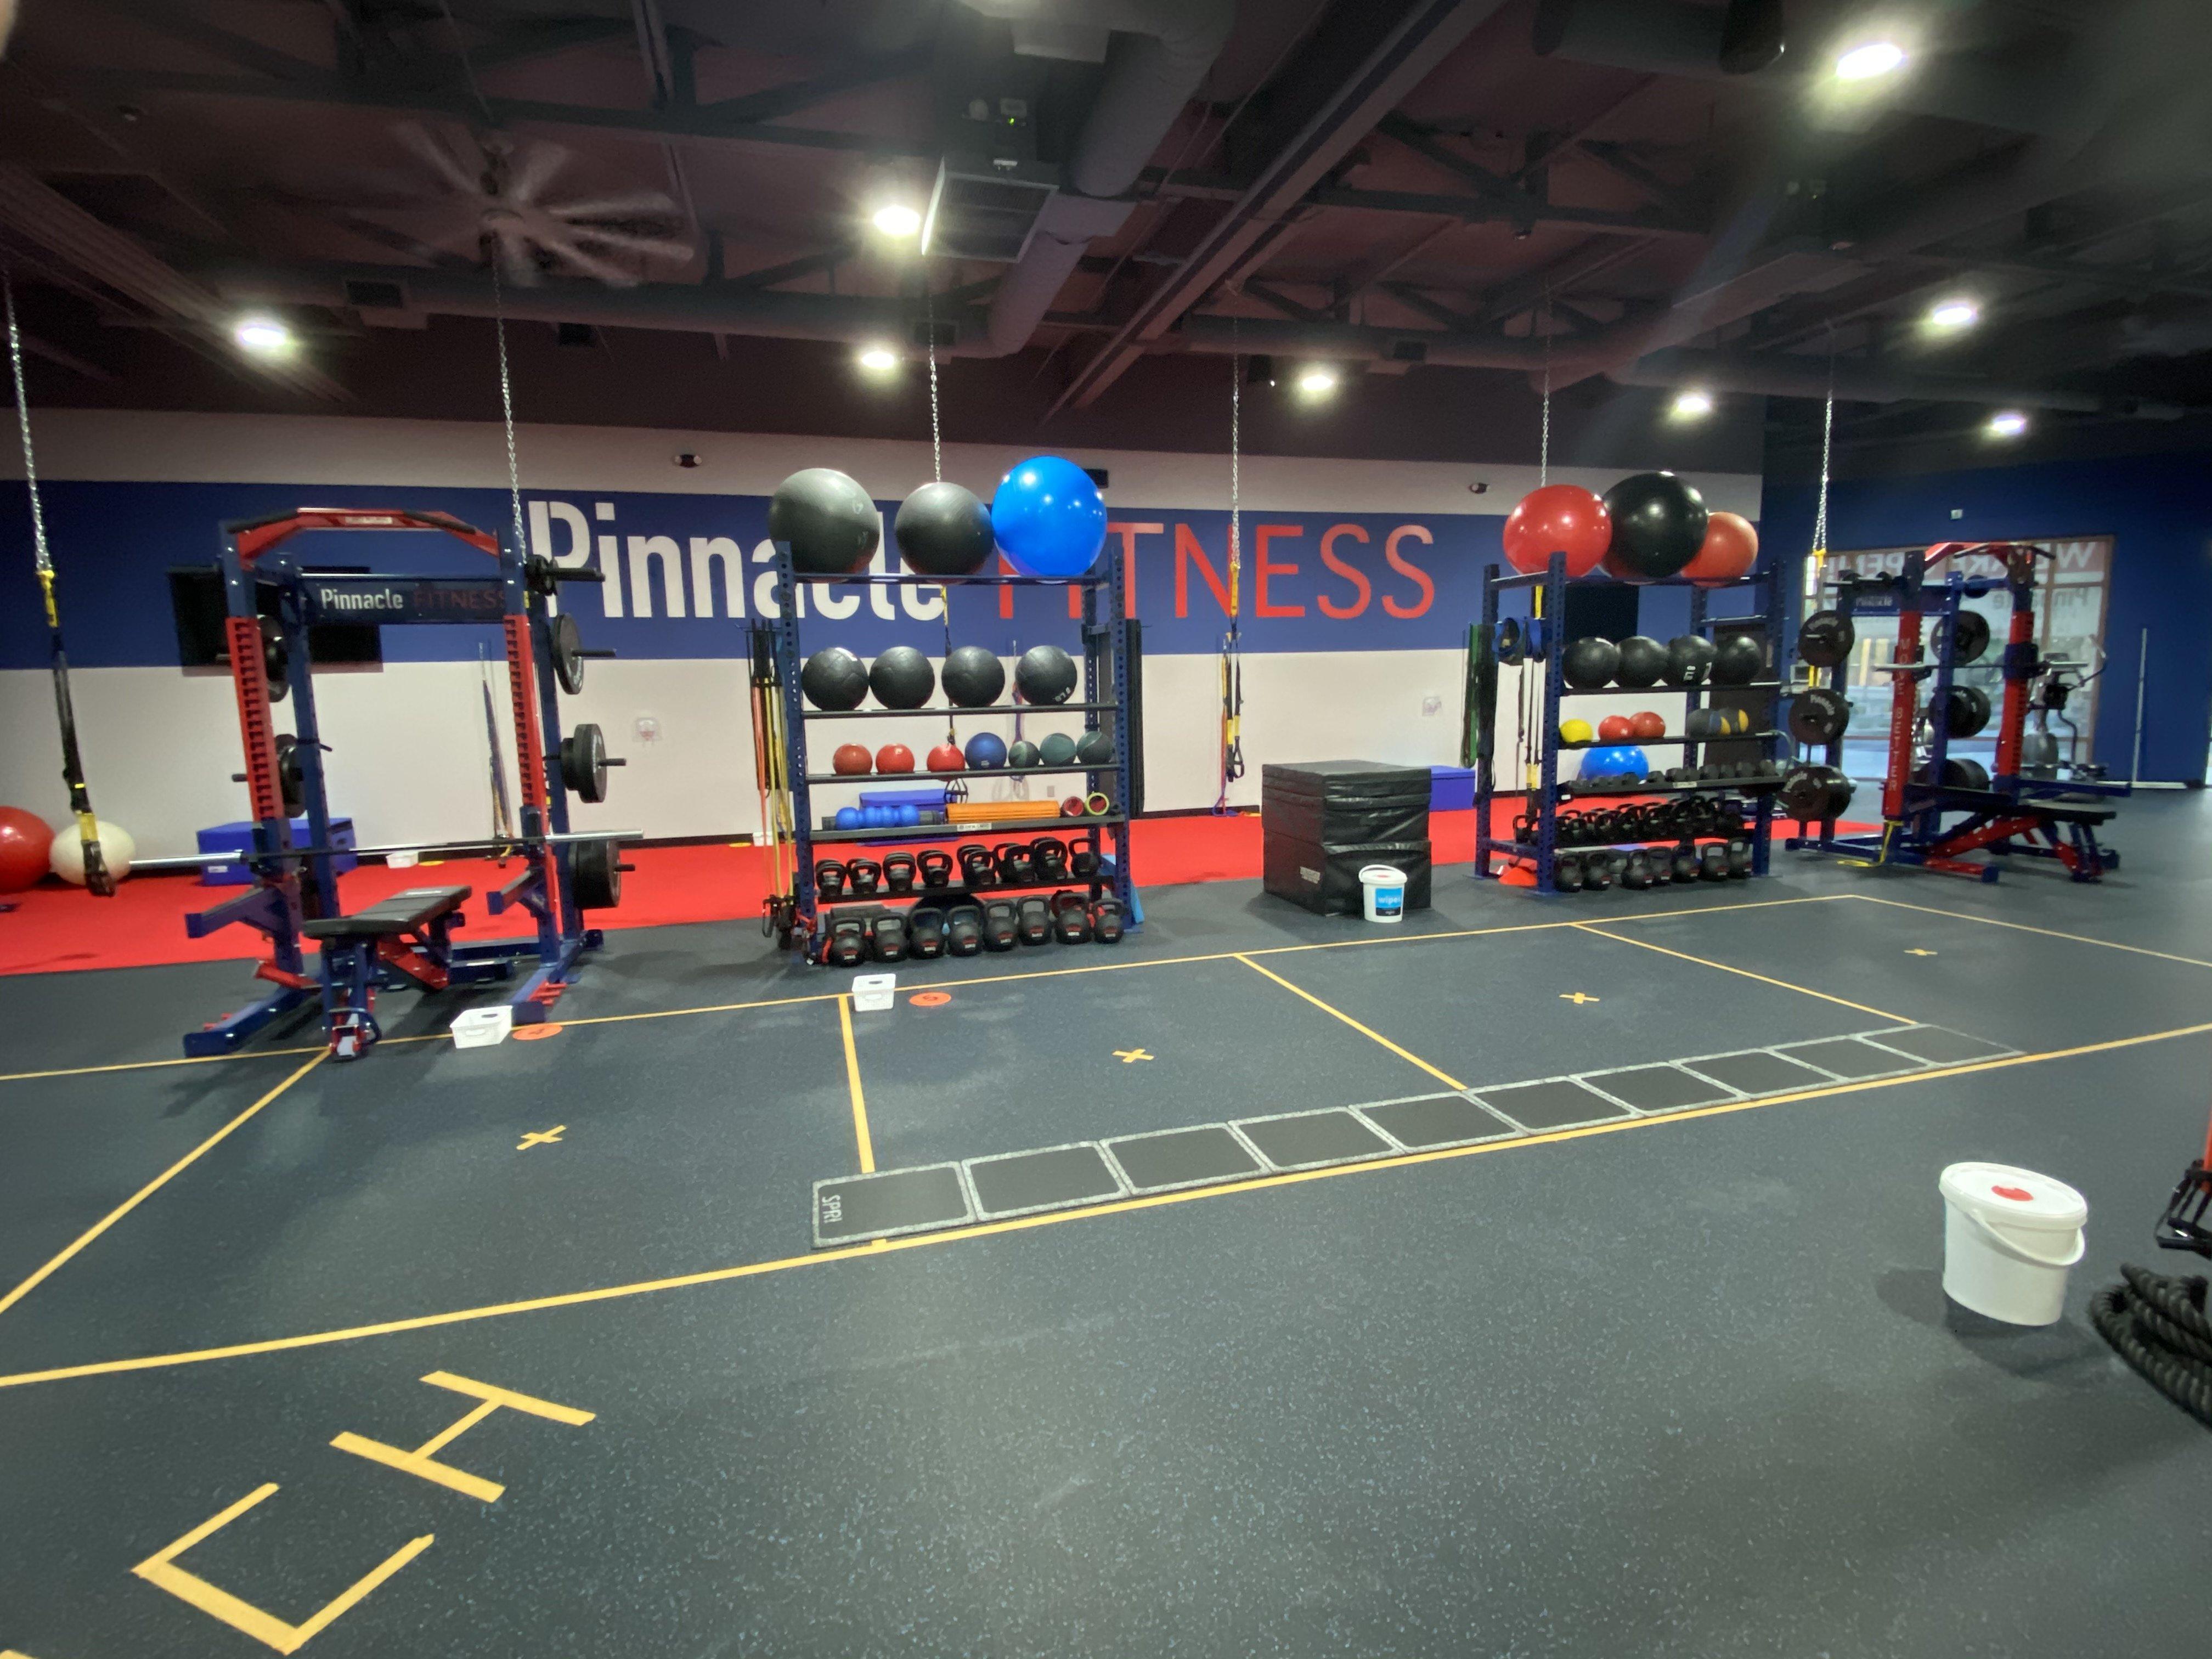 Pinnacle Fitness Az Scottsdale Gym